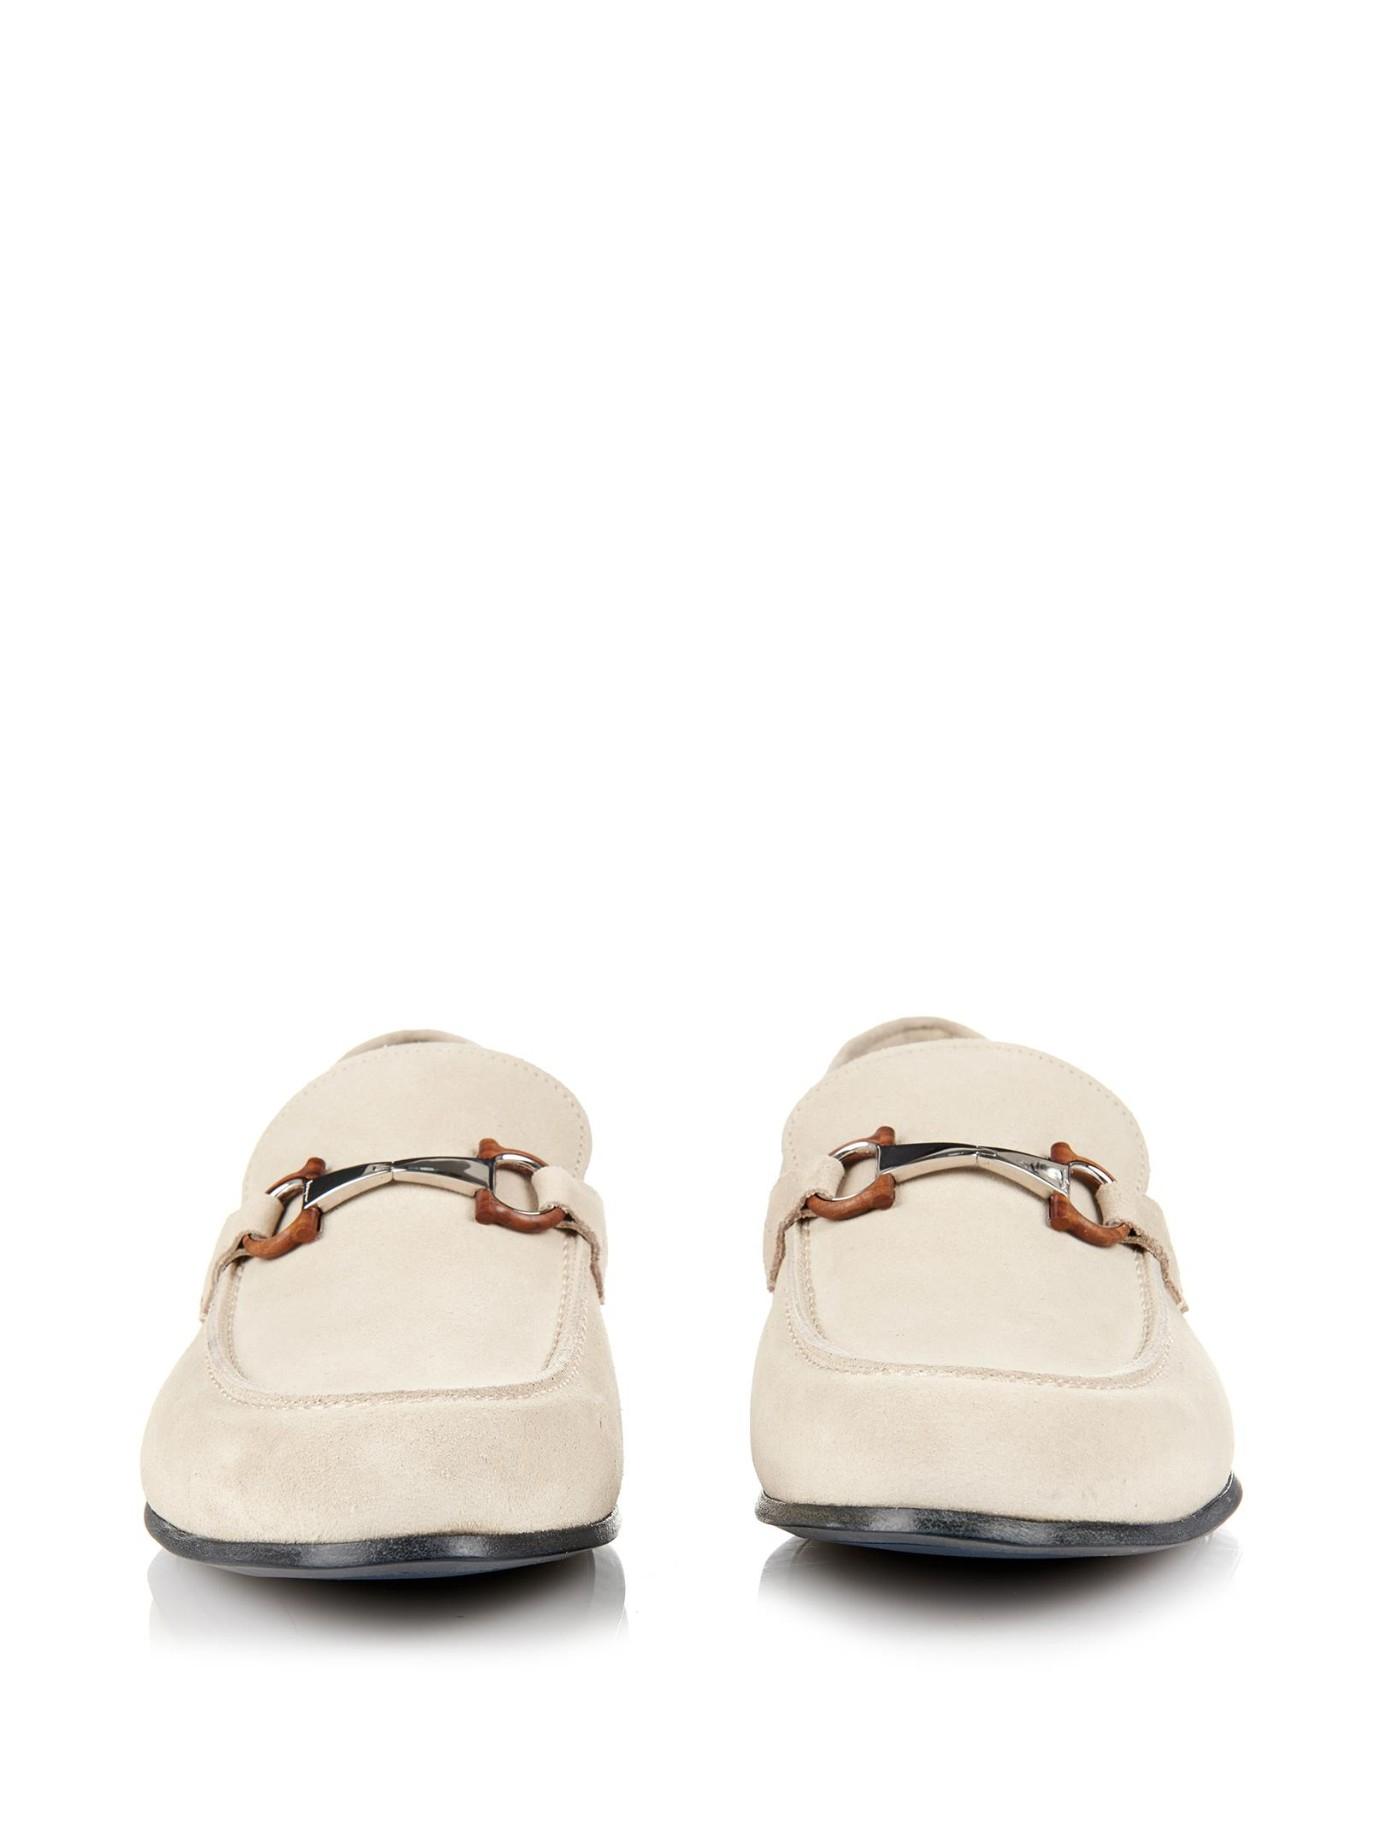 05b404599d215 Ferragamo Nepal Suede Loafers in White for Men - Lyst